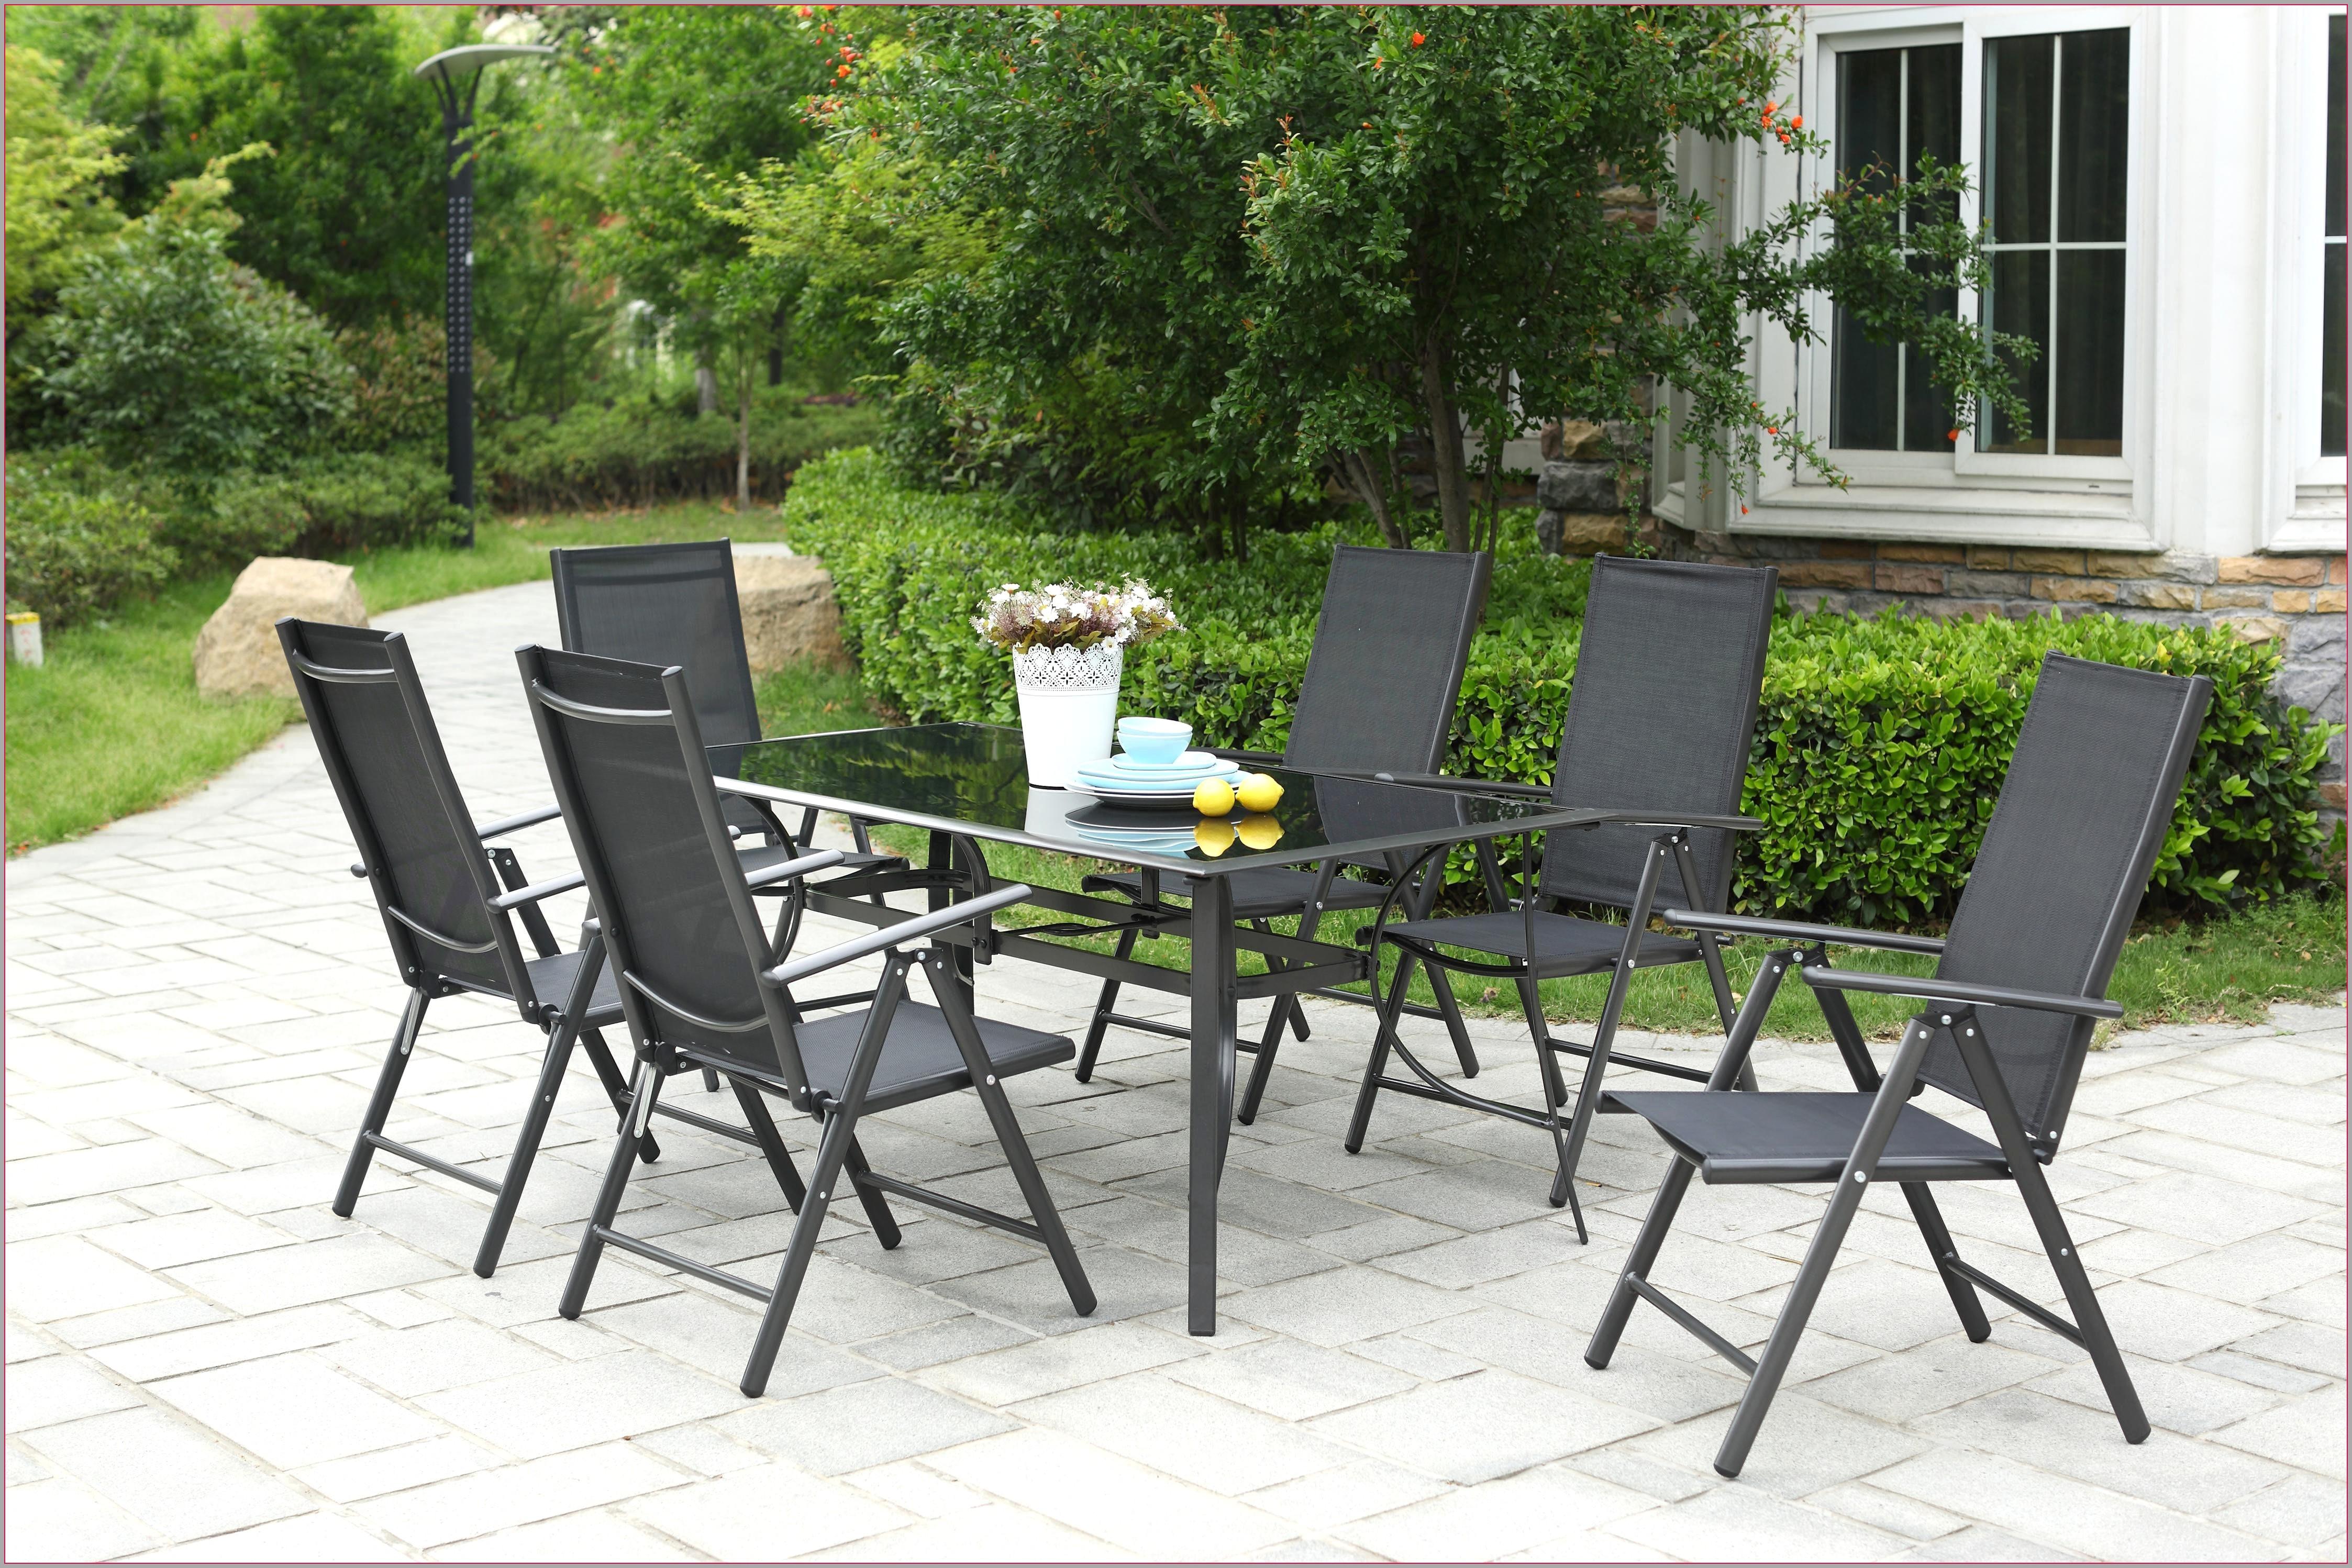 Table De Jardin 10 Personnes Castorama avec Table De Jardin 10 Personnes